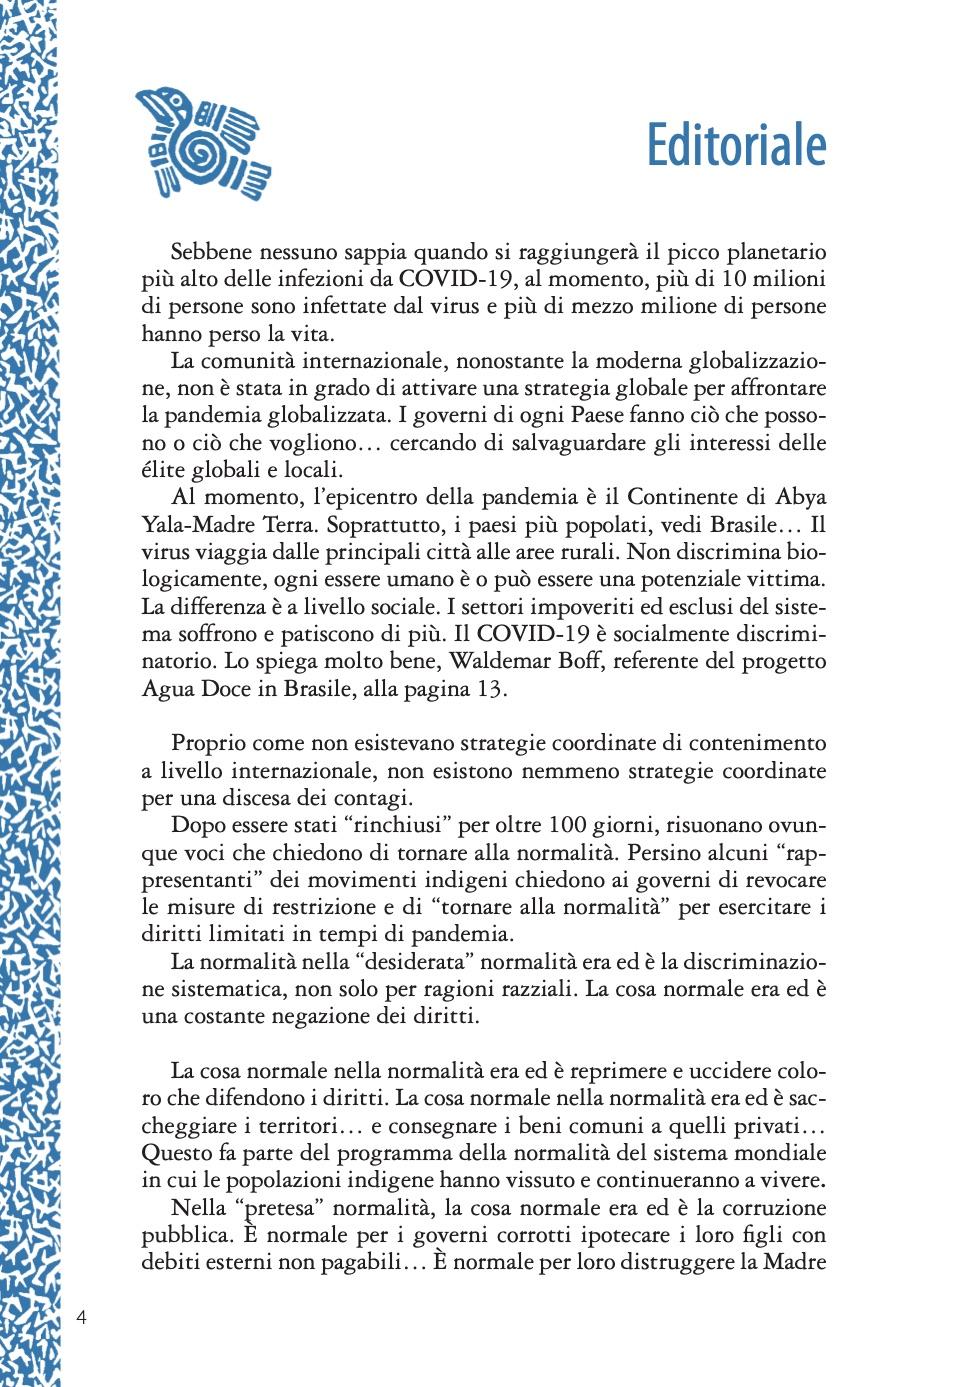 editoriale1.jpg